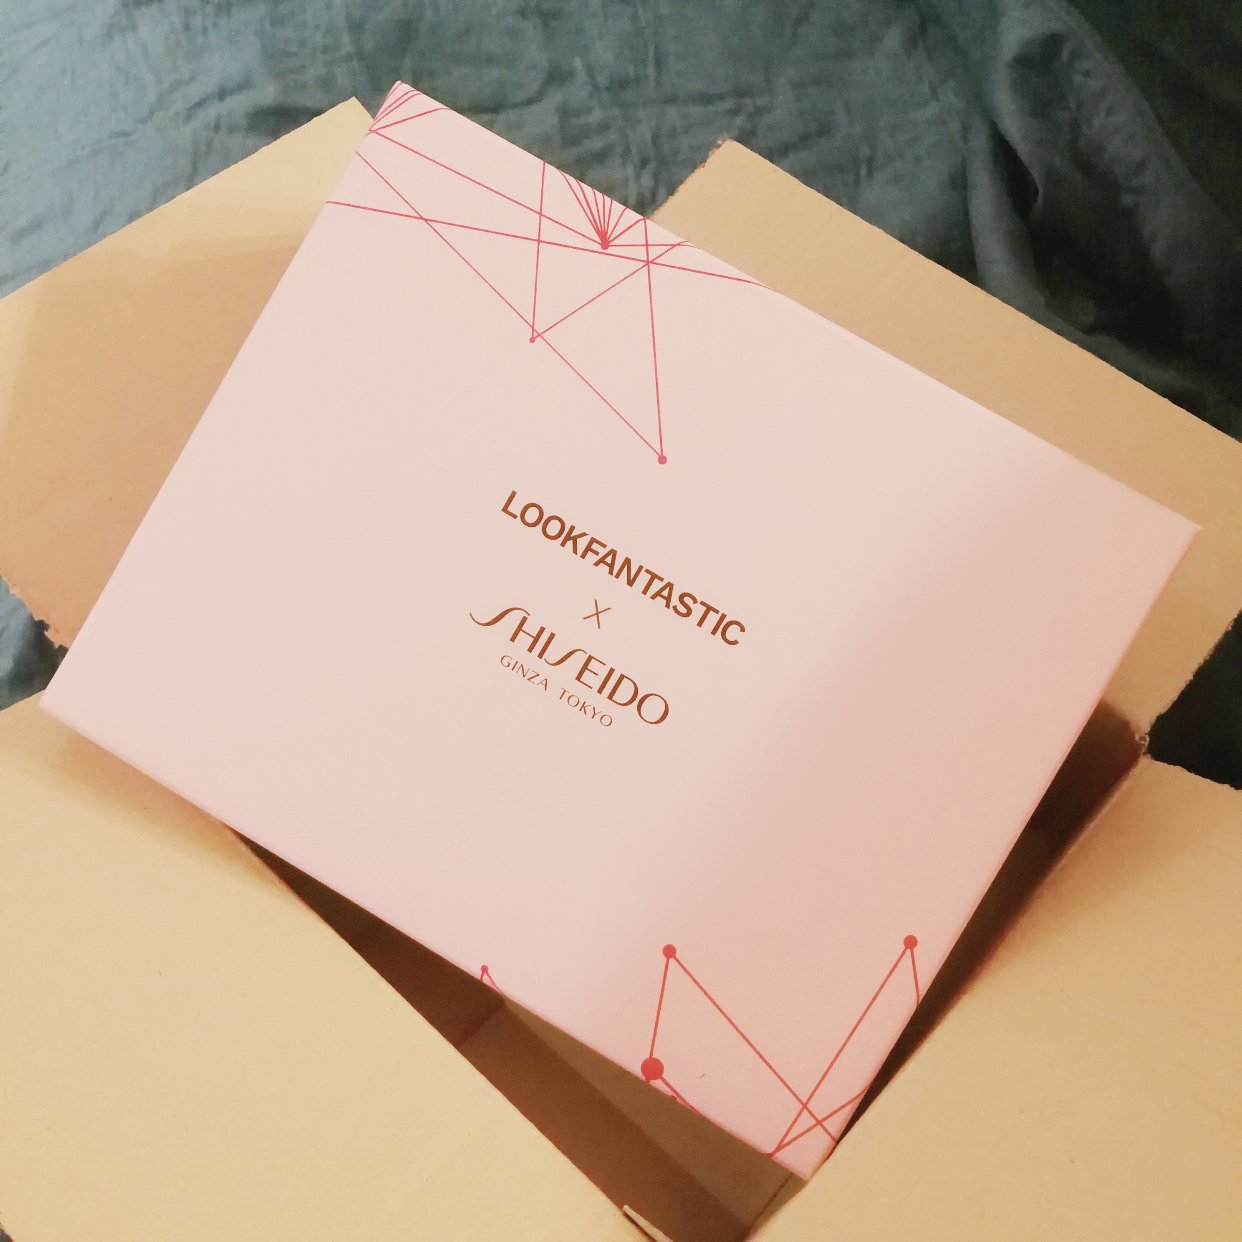 资生堂礼盒 + la mer薅羊毛开箱Review